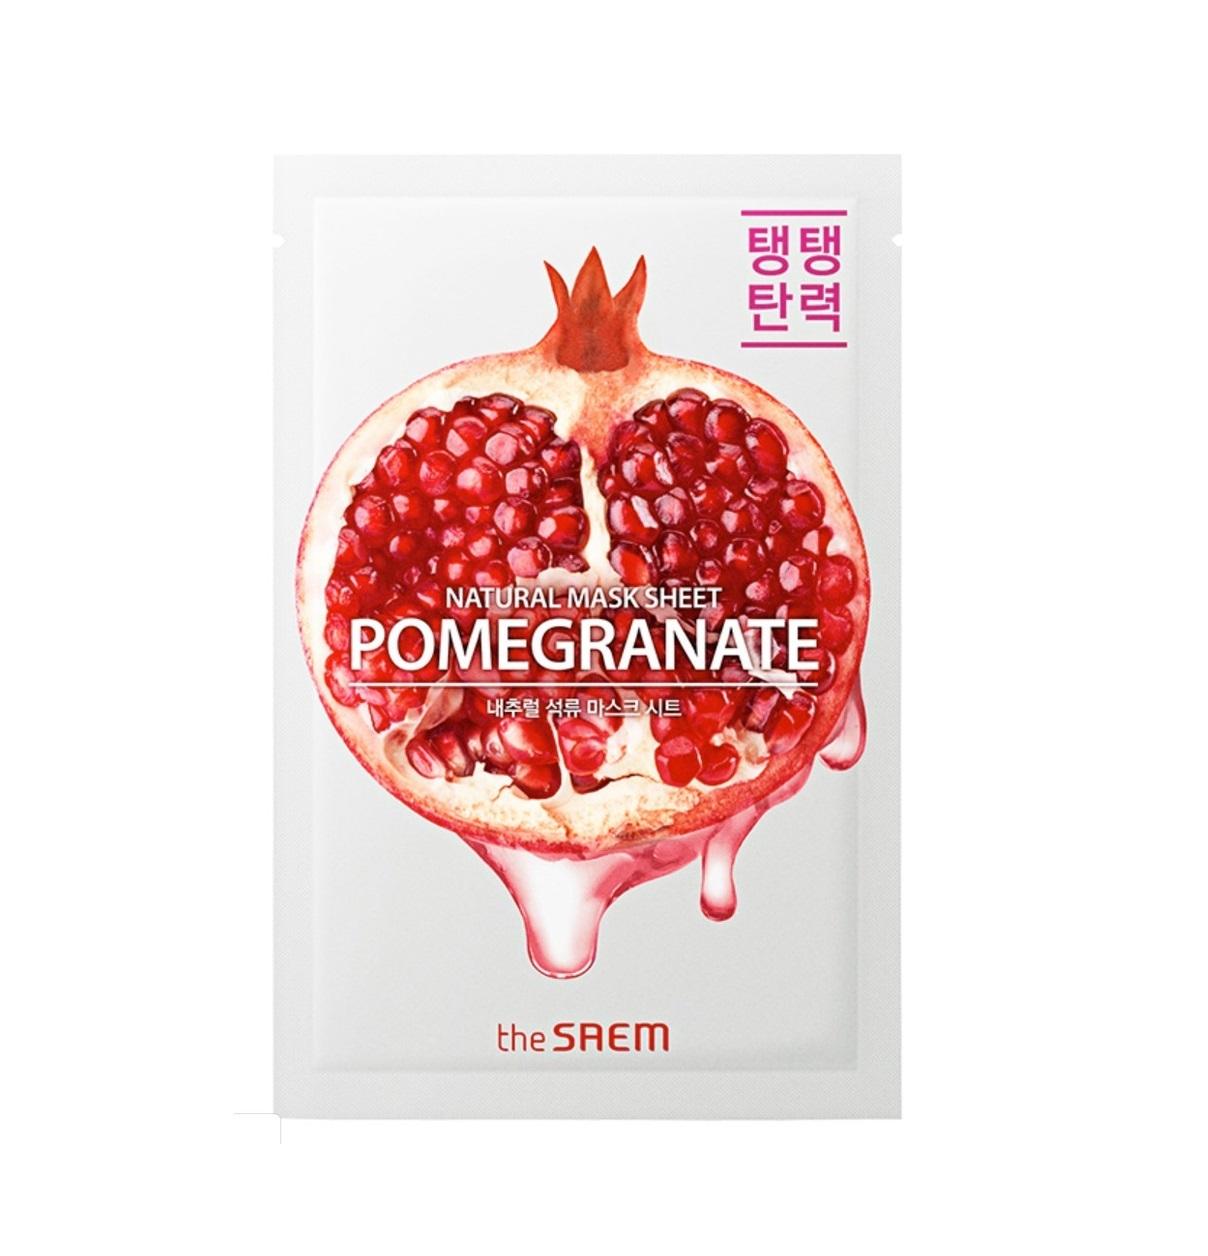 the SAEM Маска тканевая для лица с экстрактом граната the SAEM Natural Pomegranate Mask Sheet 21 мл 1-3.jpg